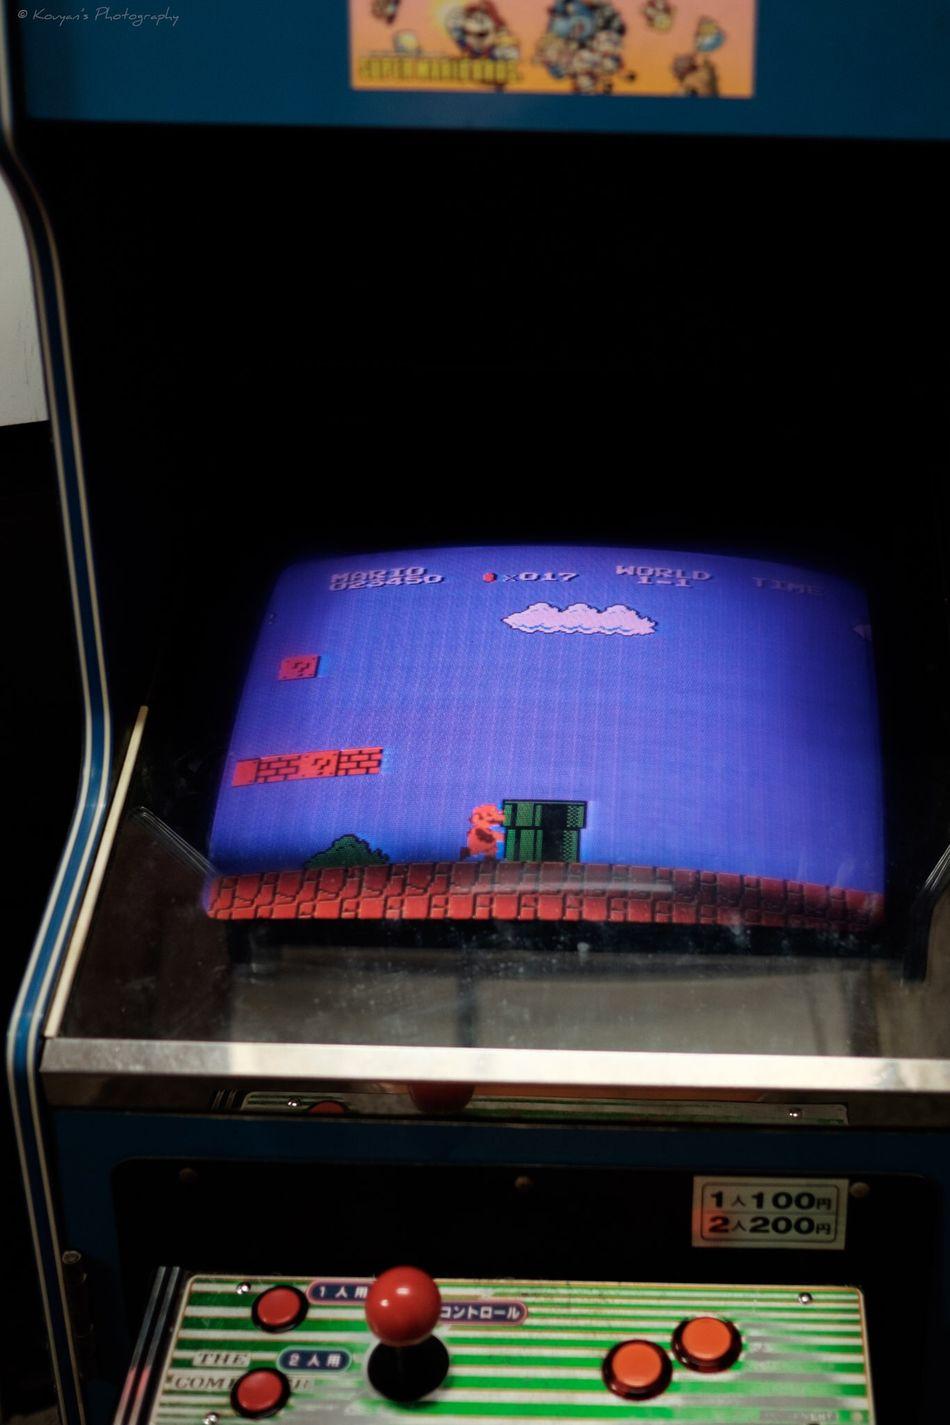 Mario Bros Mom-and-pop Candy Store Nostalgic  Game Old Memories Fujifilm_xseries FUJIFILM X-T1 XF 23mm F1.4 R TOWNSCAPE EyeEm